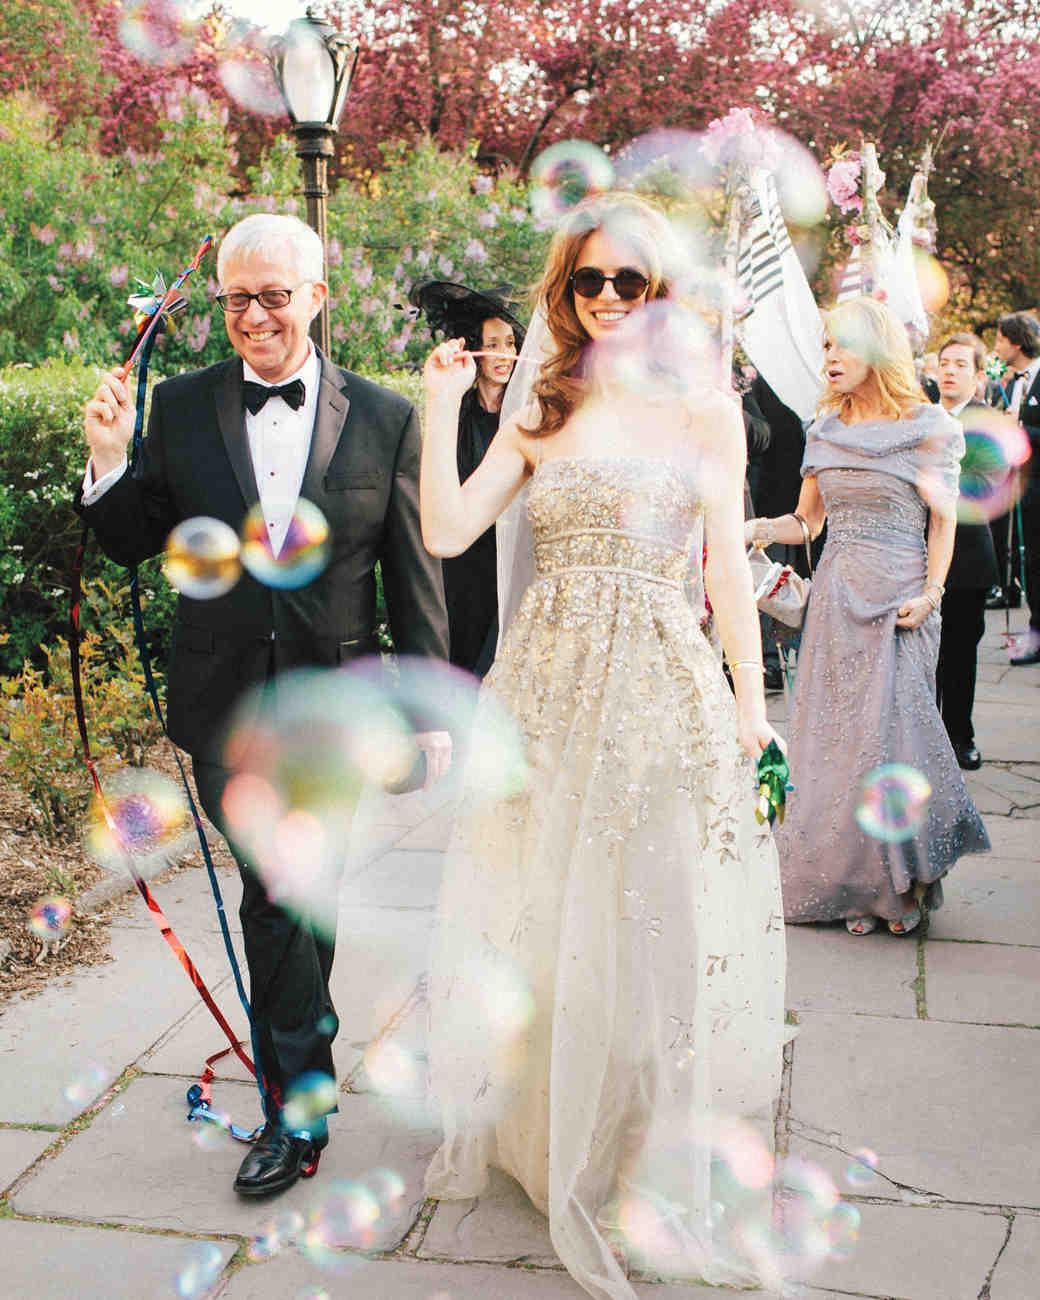 lisa-eric-bubbles-515-mwds110657.jpg